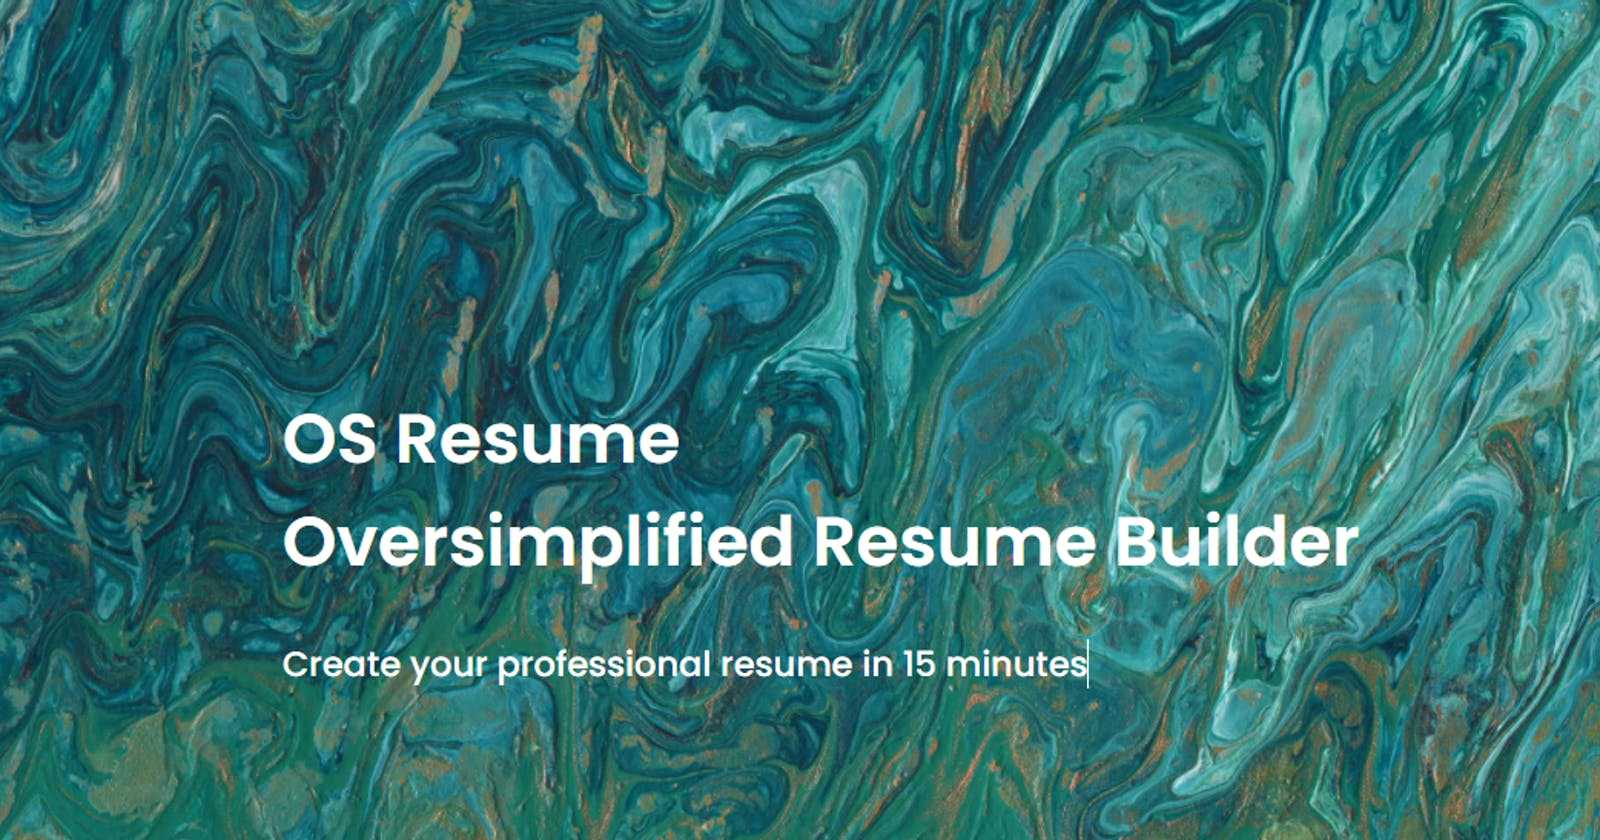 Introducing OS Resume (Oversimplified Resume Builder)